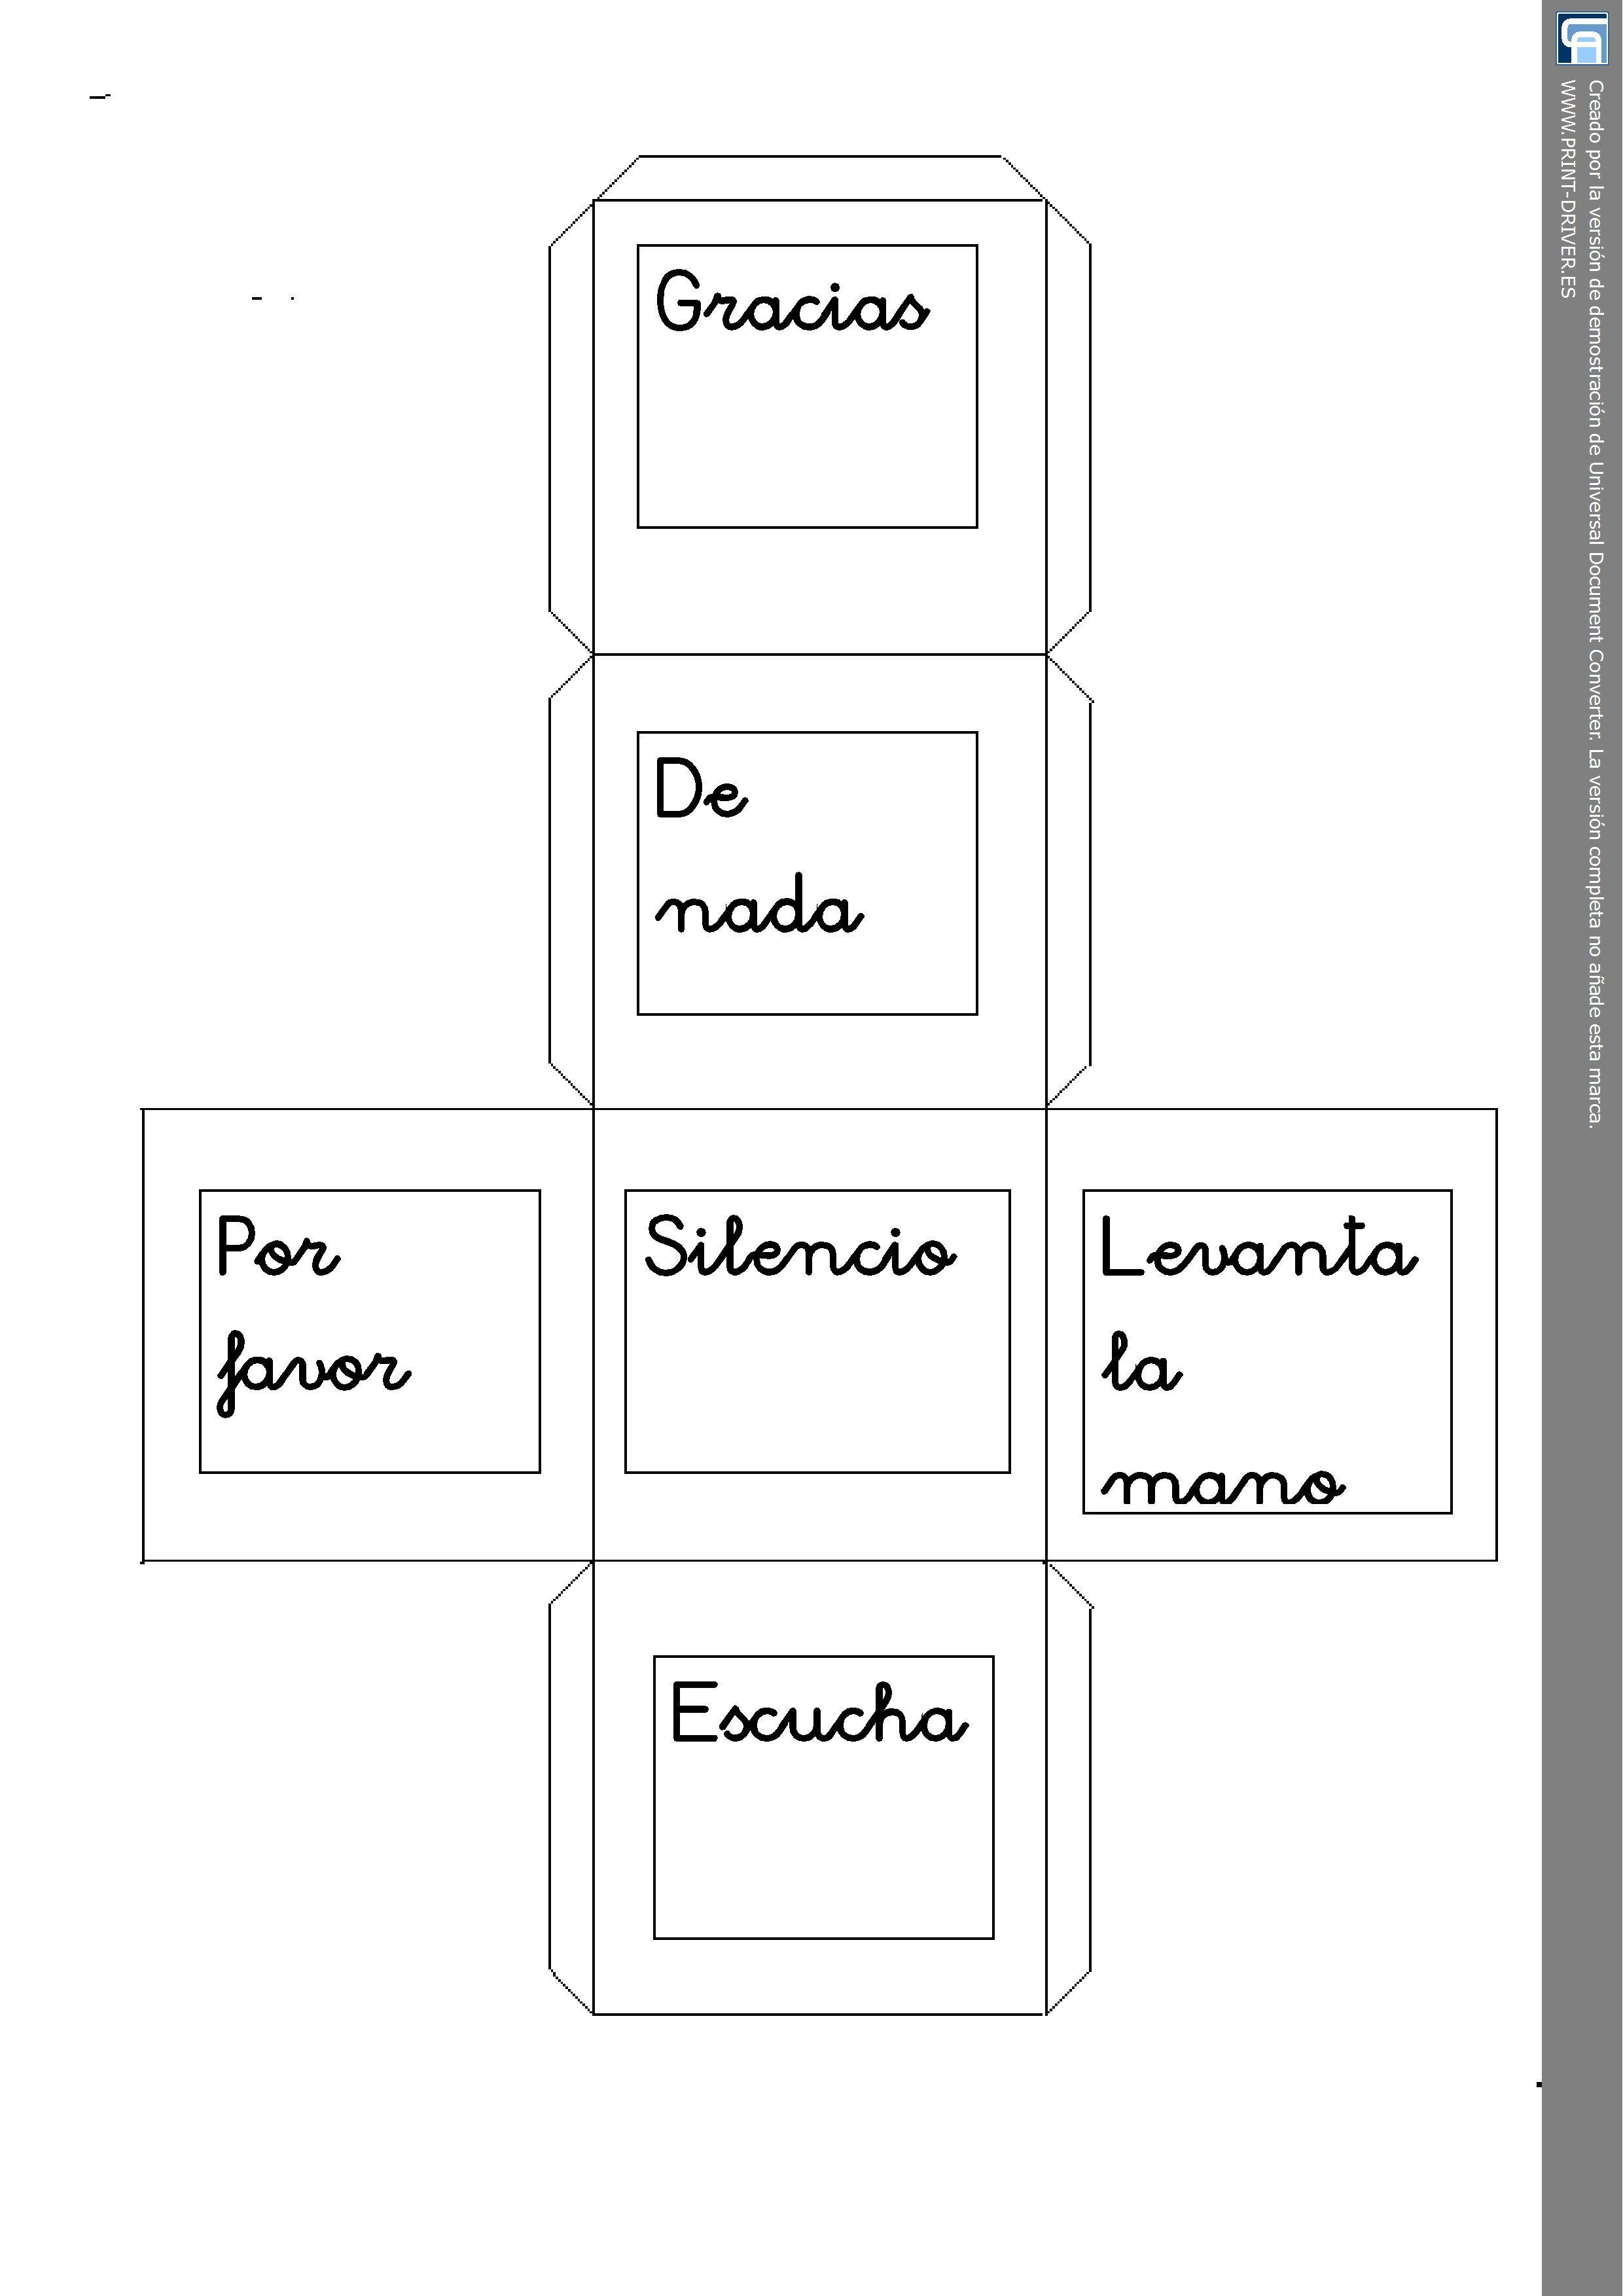 Dice Spanish Greetings Worksheet Personal Teaching